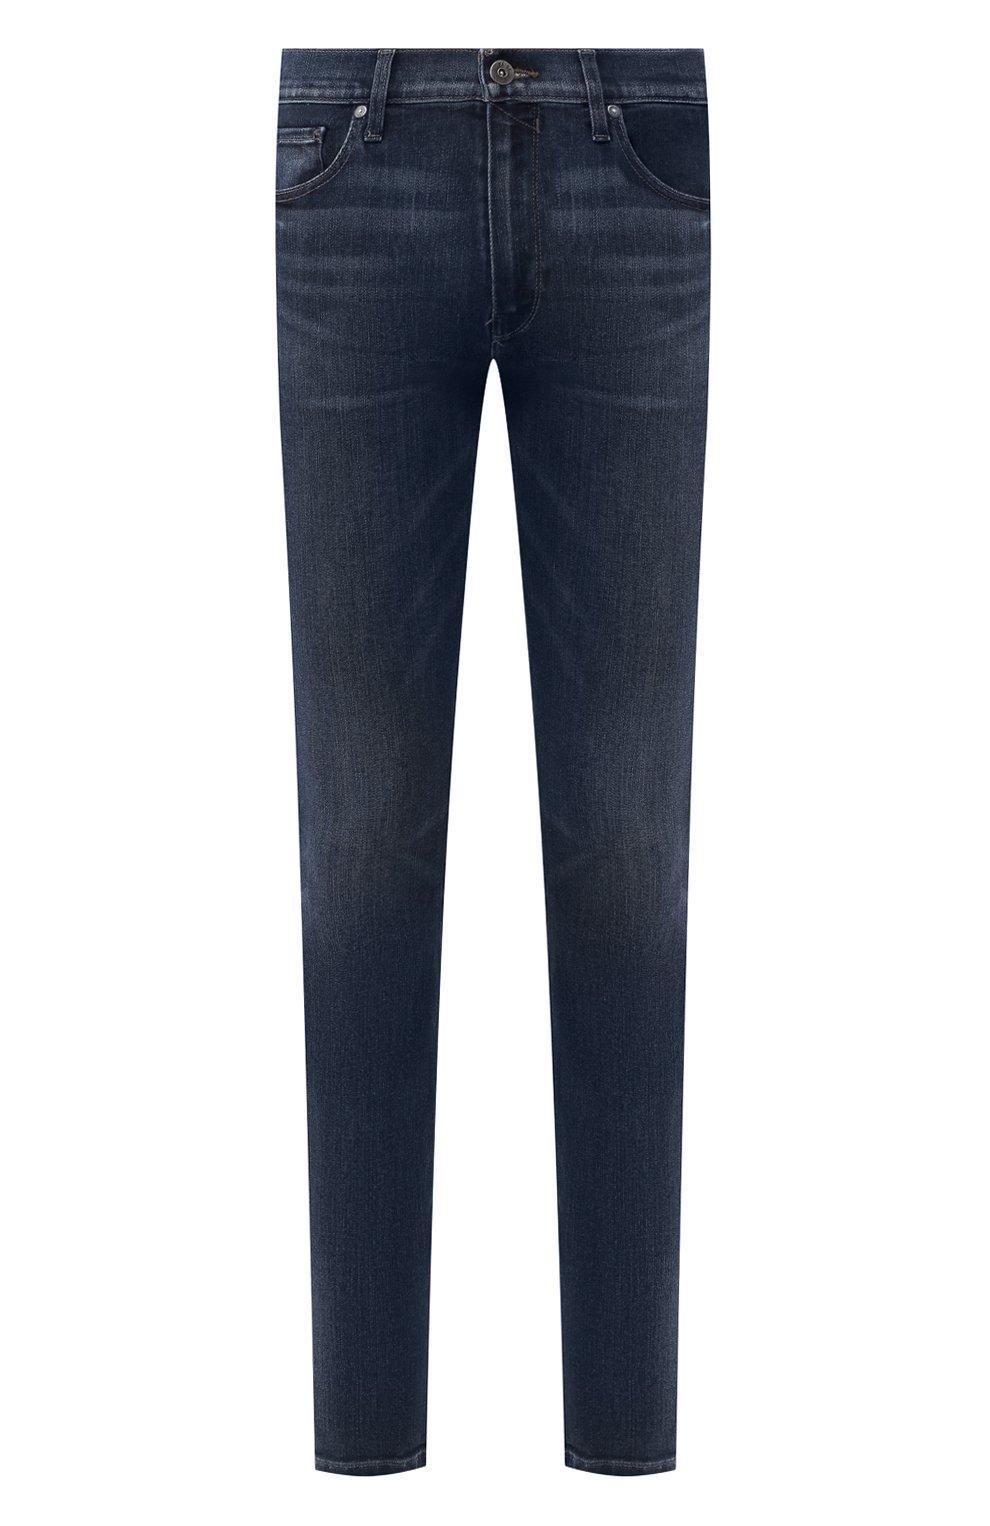 Мужские джинсы PAIGE синего цвета, арт. M653C72-7156 | Фото 1